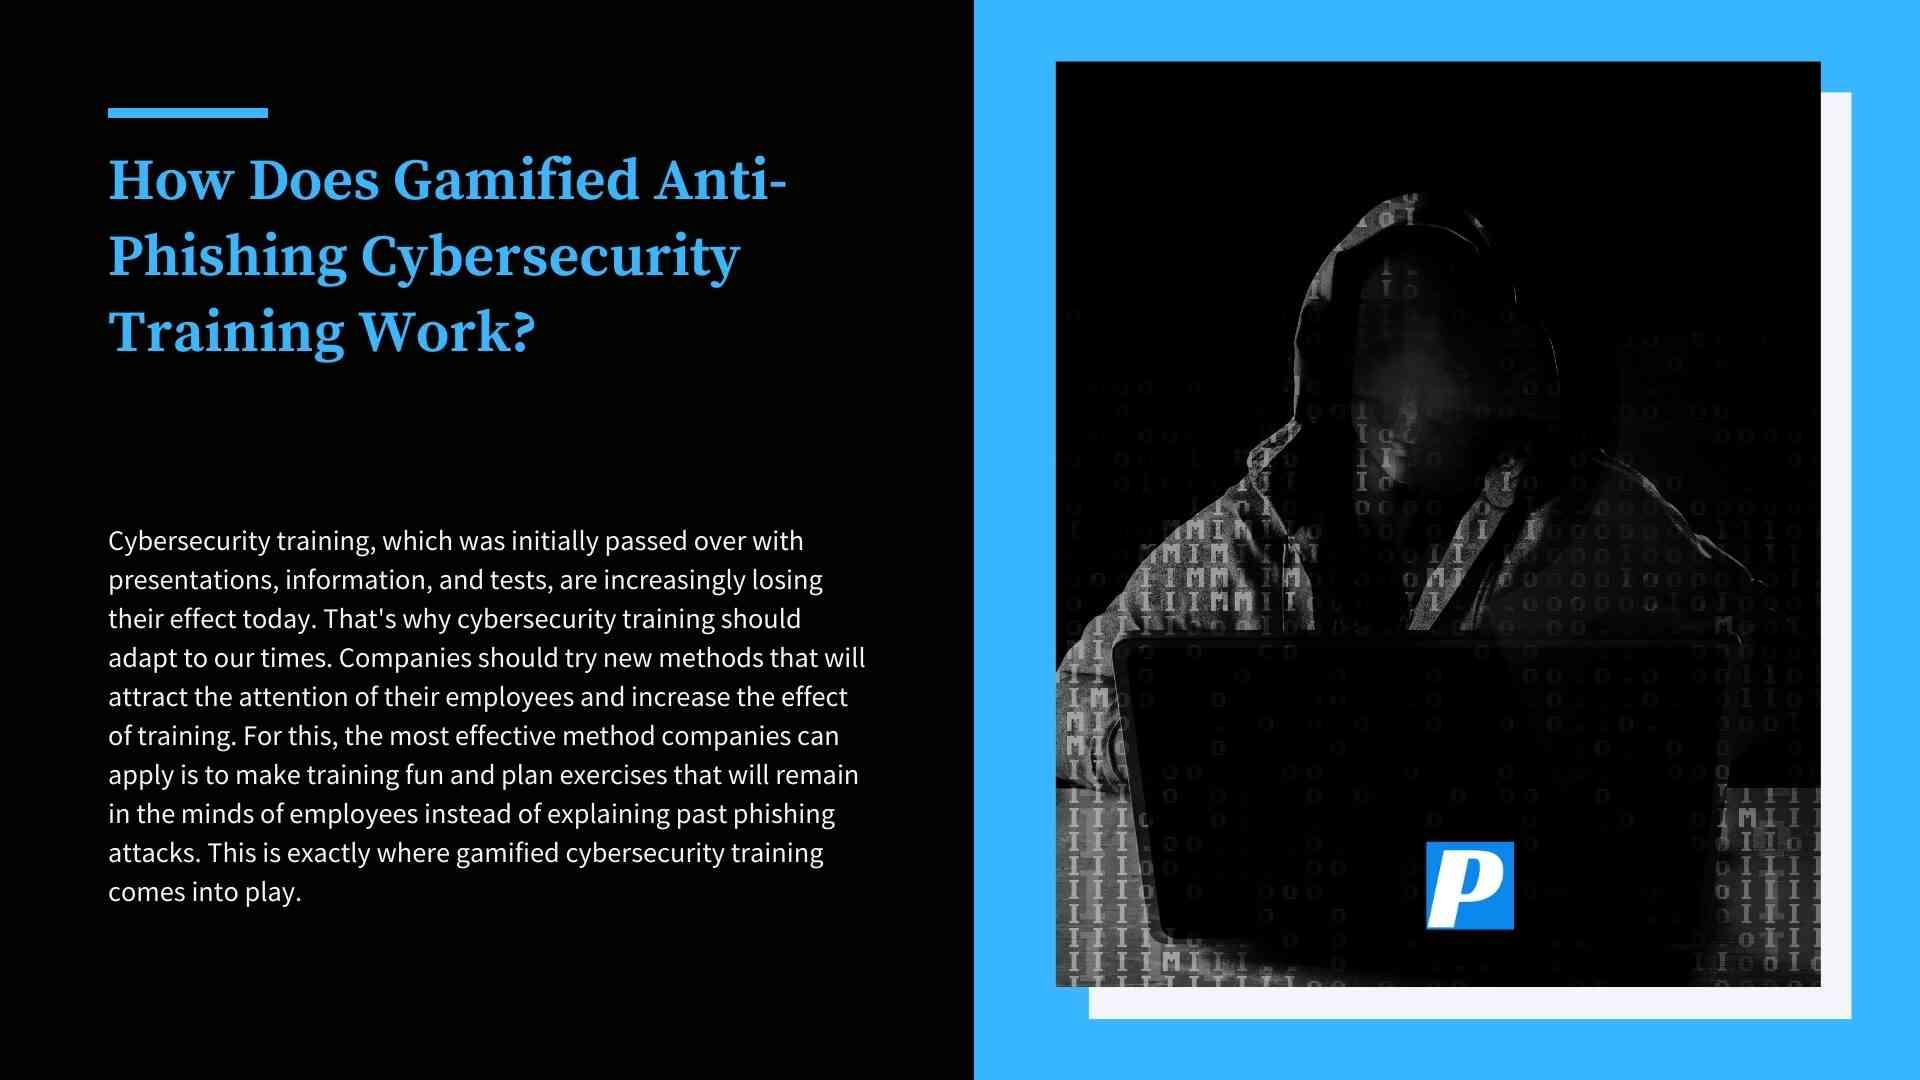 Gamified Anti-Phishing Cybersecurity Training